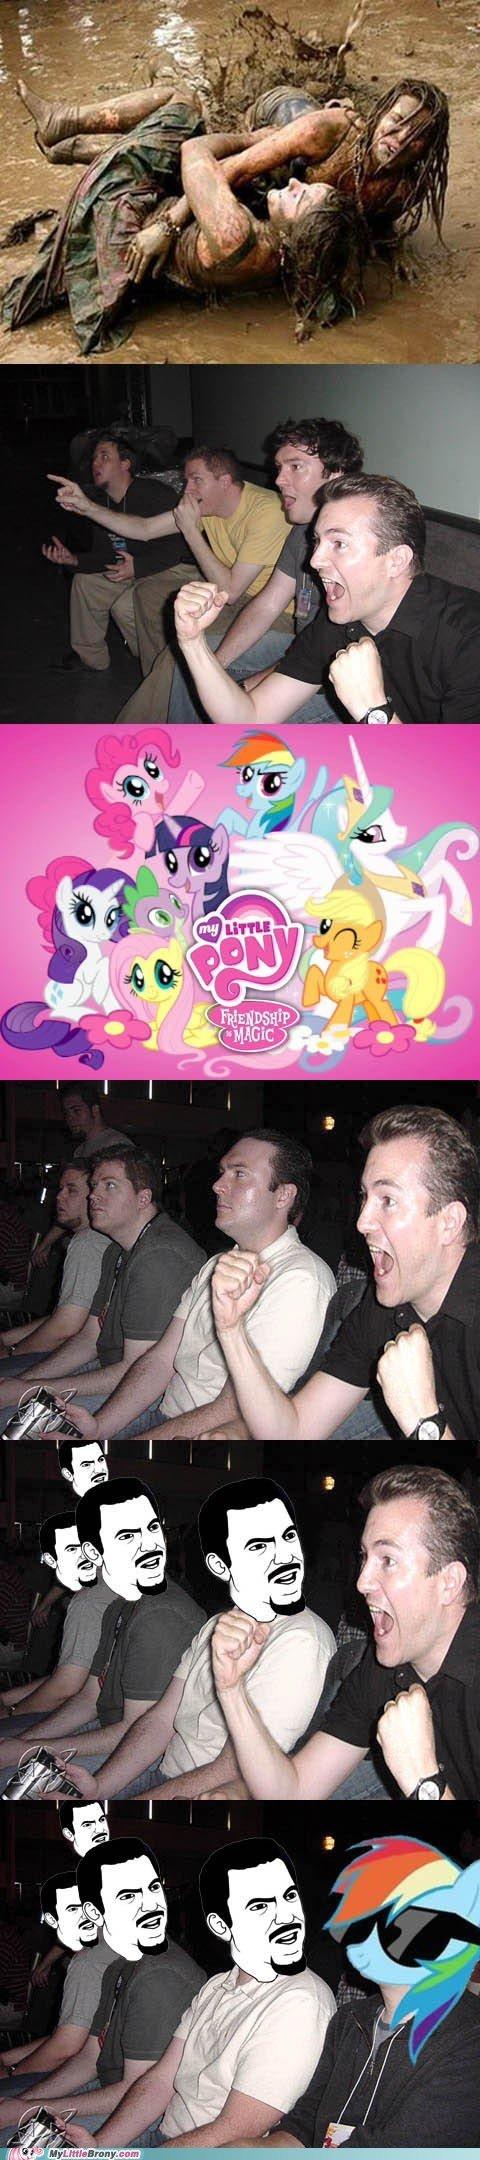 Deal With It. .. MFW Ponies Deal With It MFW Ponies